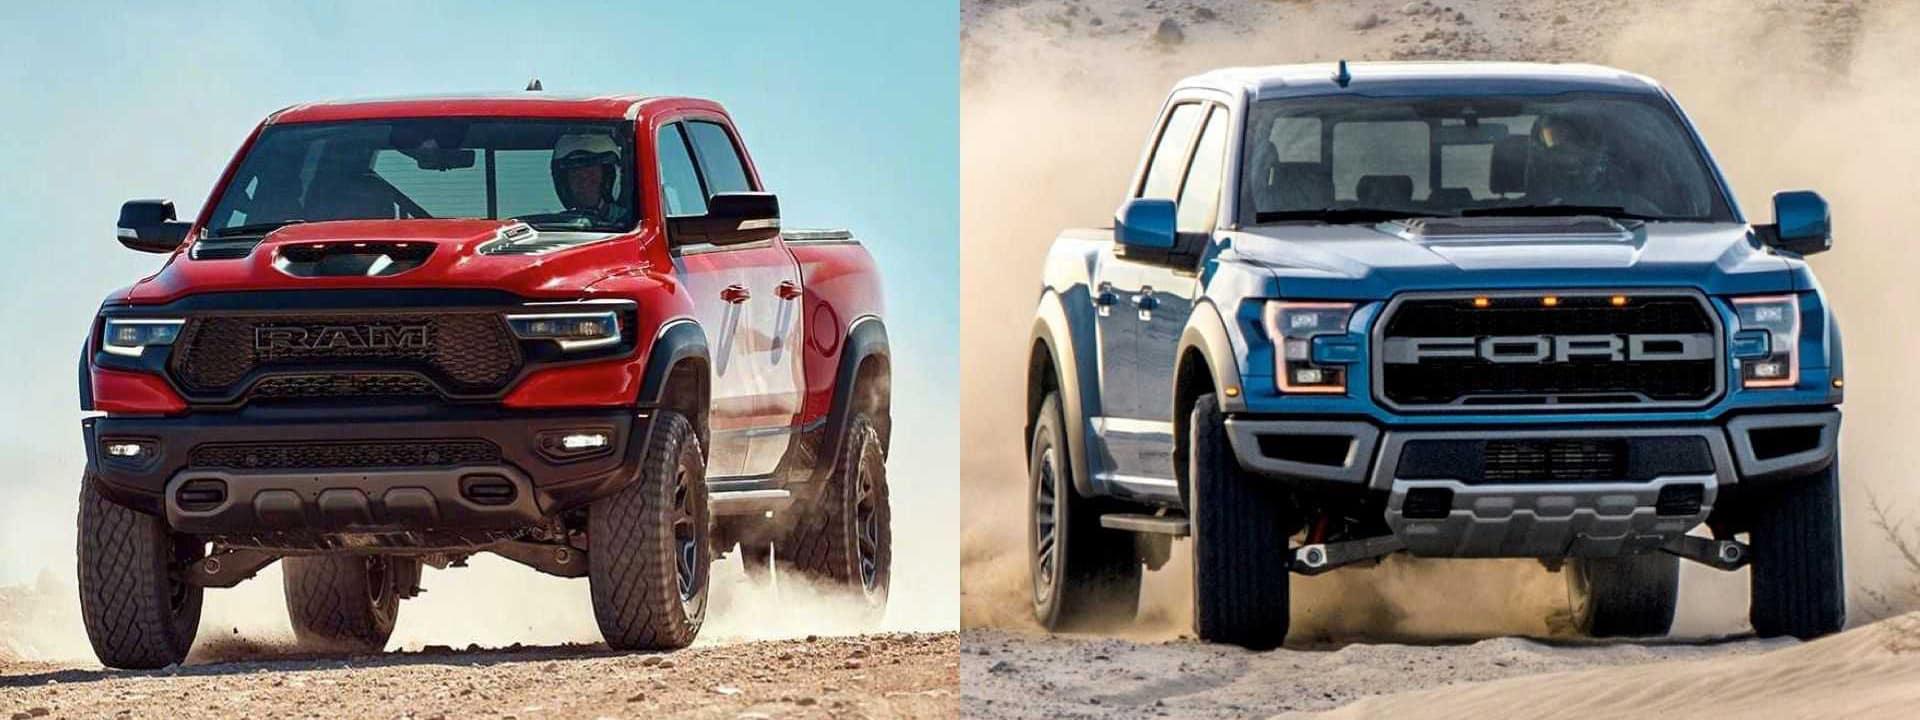 RAM TRX vs Ford Raptor